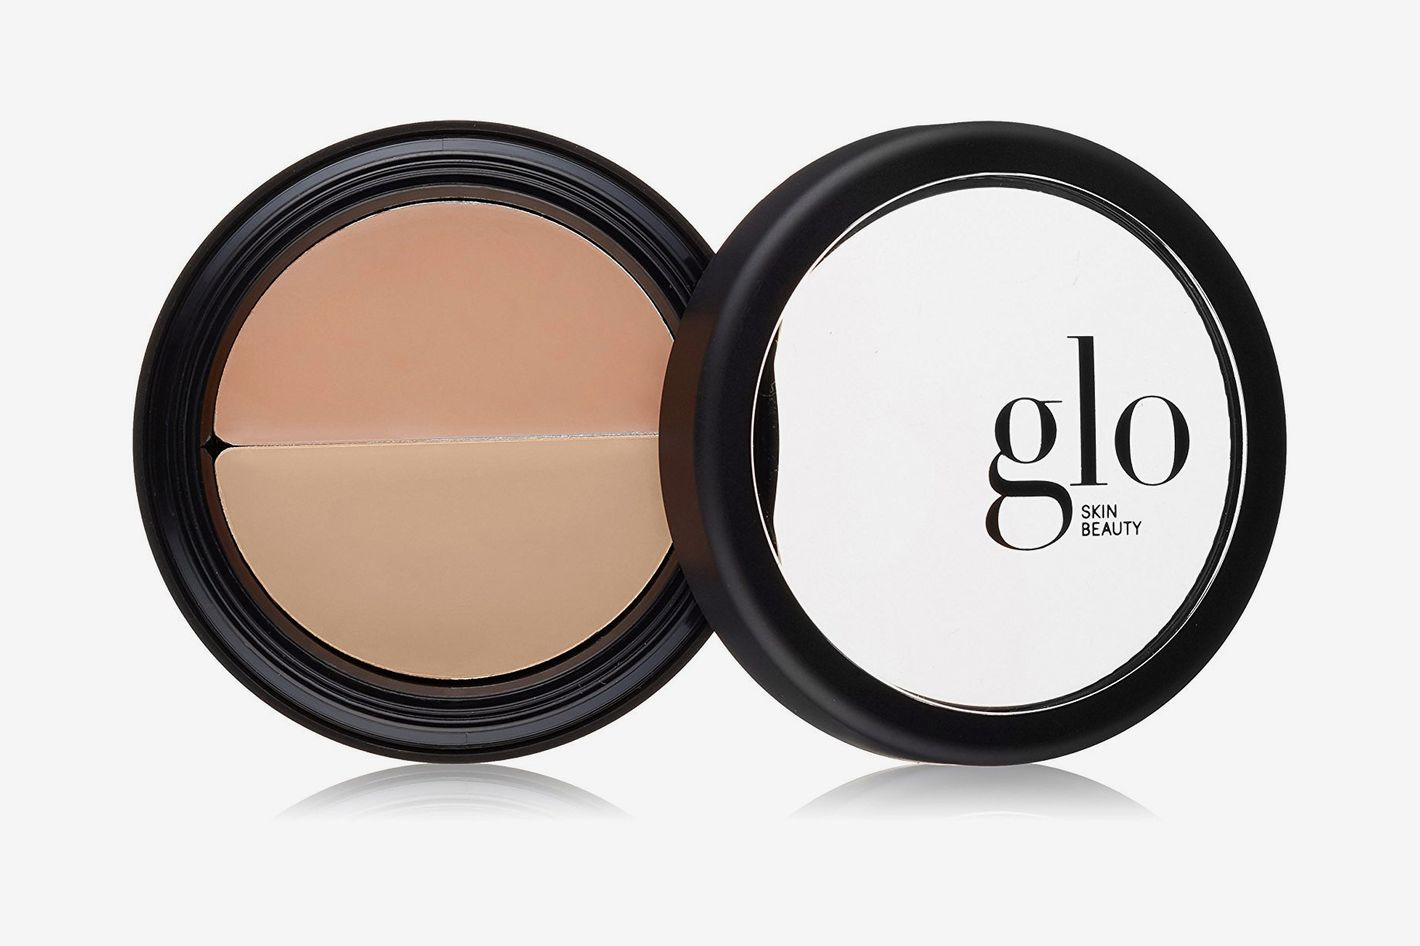 Glo Minerals Beauty Under-Eye Concealer